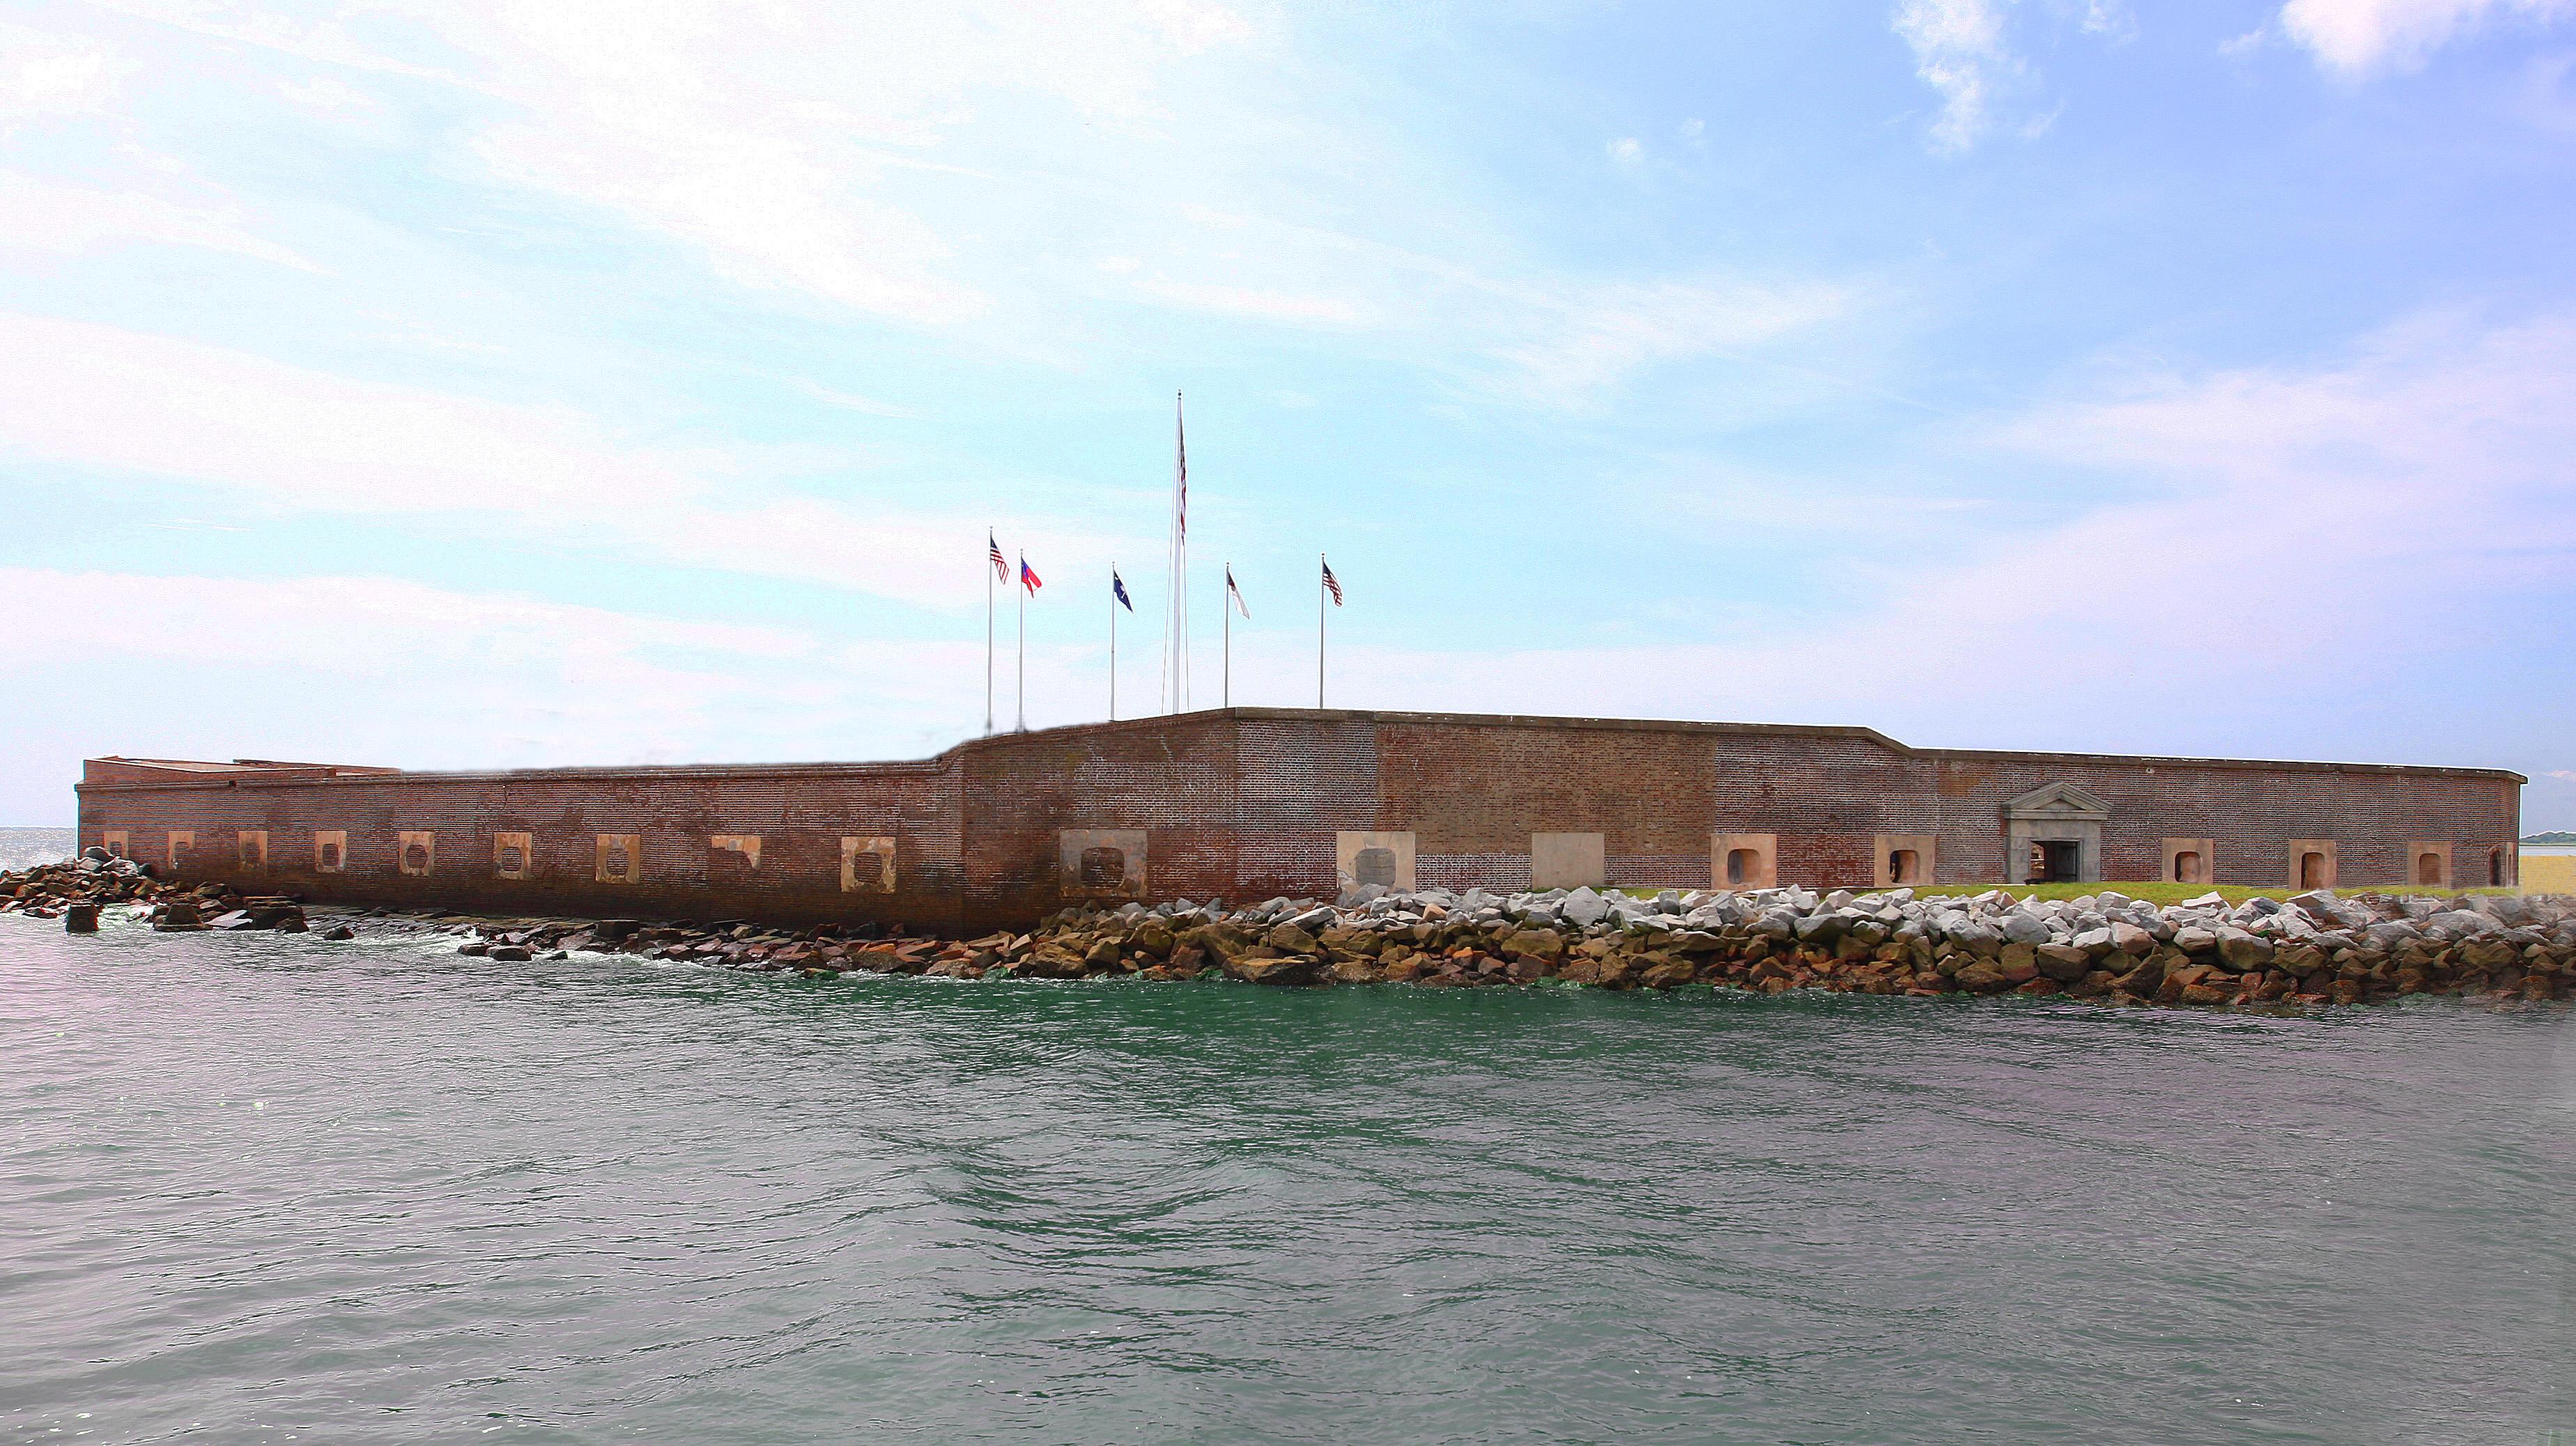 File:Ft. Sumter inside ground 2.jpg - Wikimedia Commons